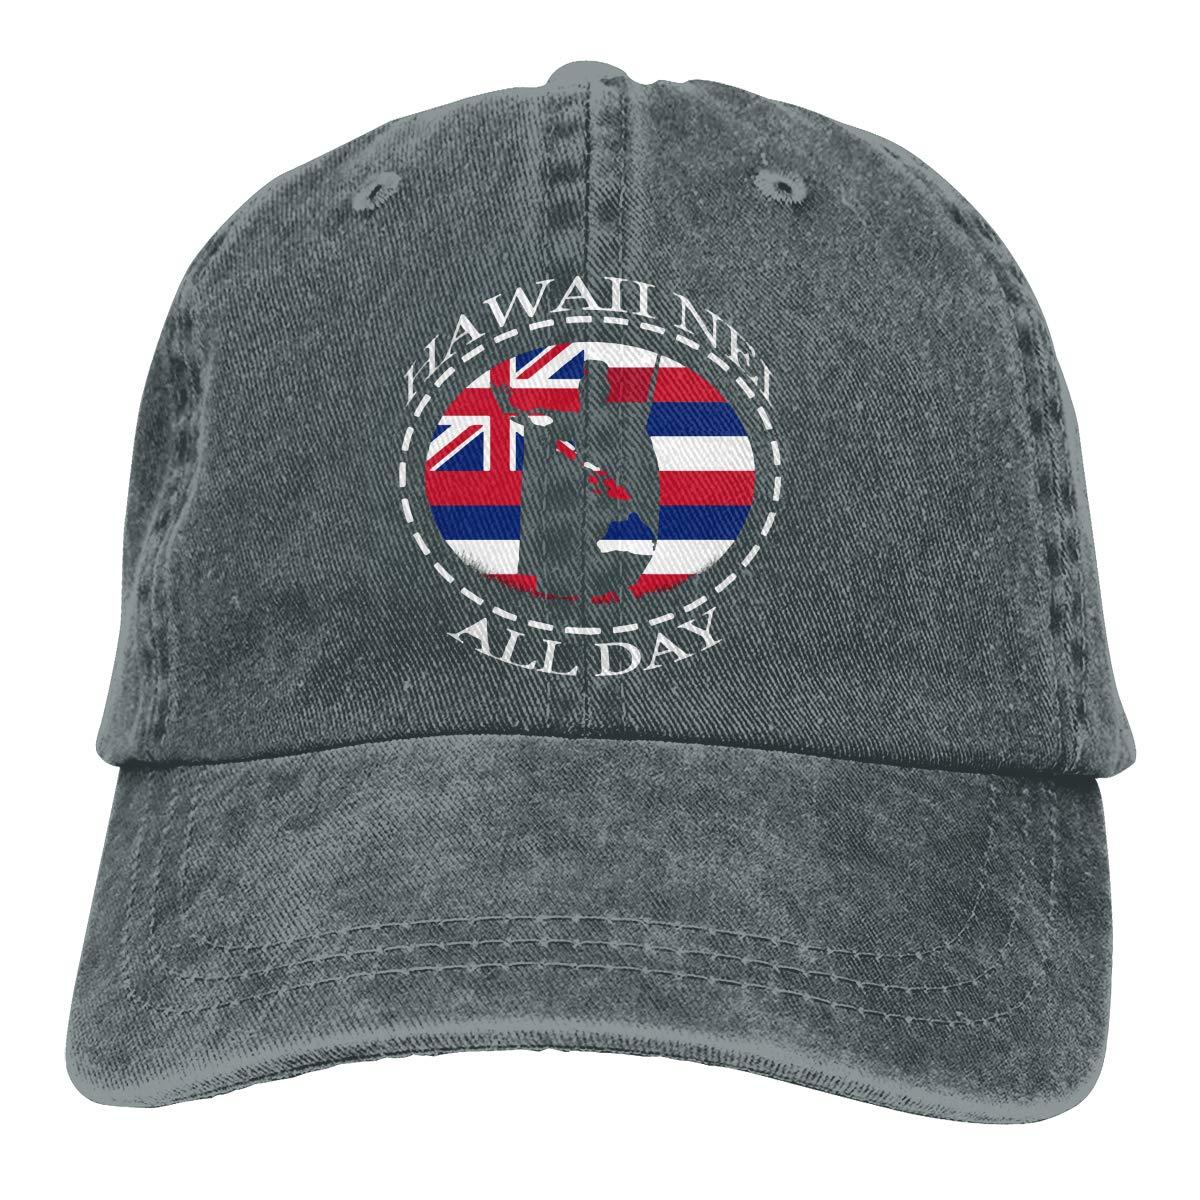 The Rising Sun King Unisex Adult Cowboy Hat Hip Hop Cap Adjustable Baseball Cap